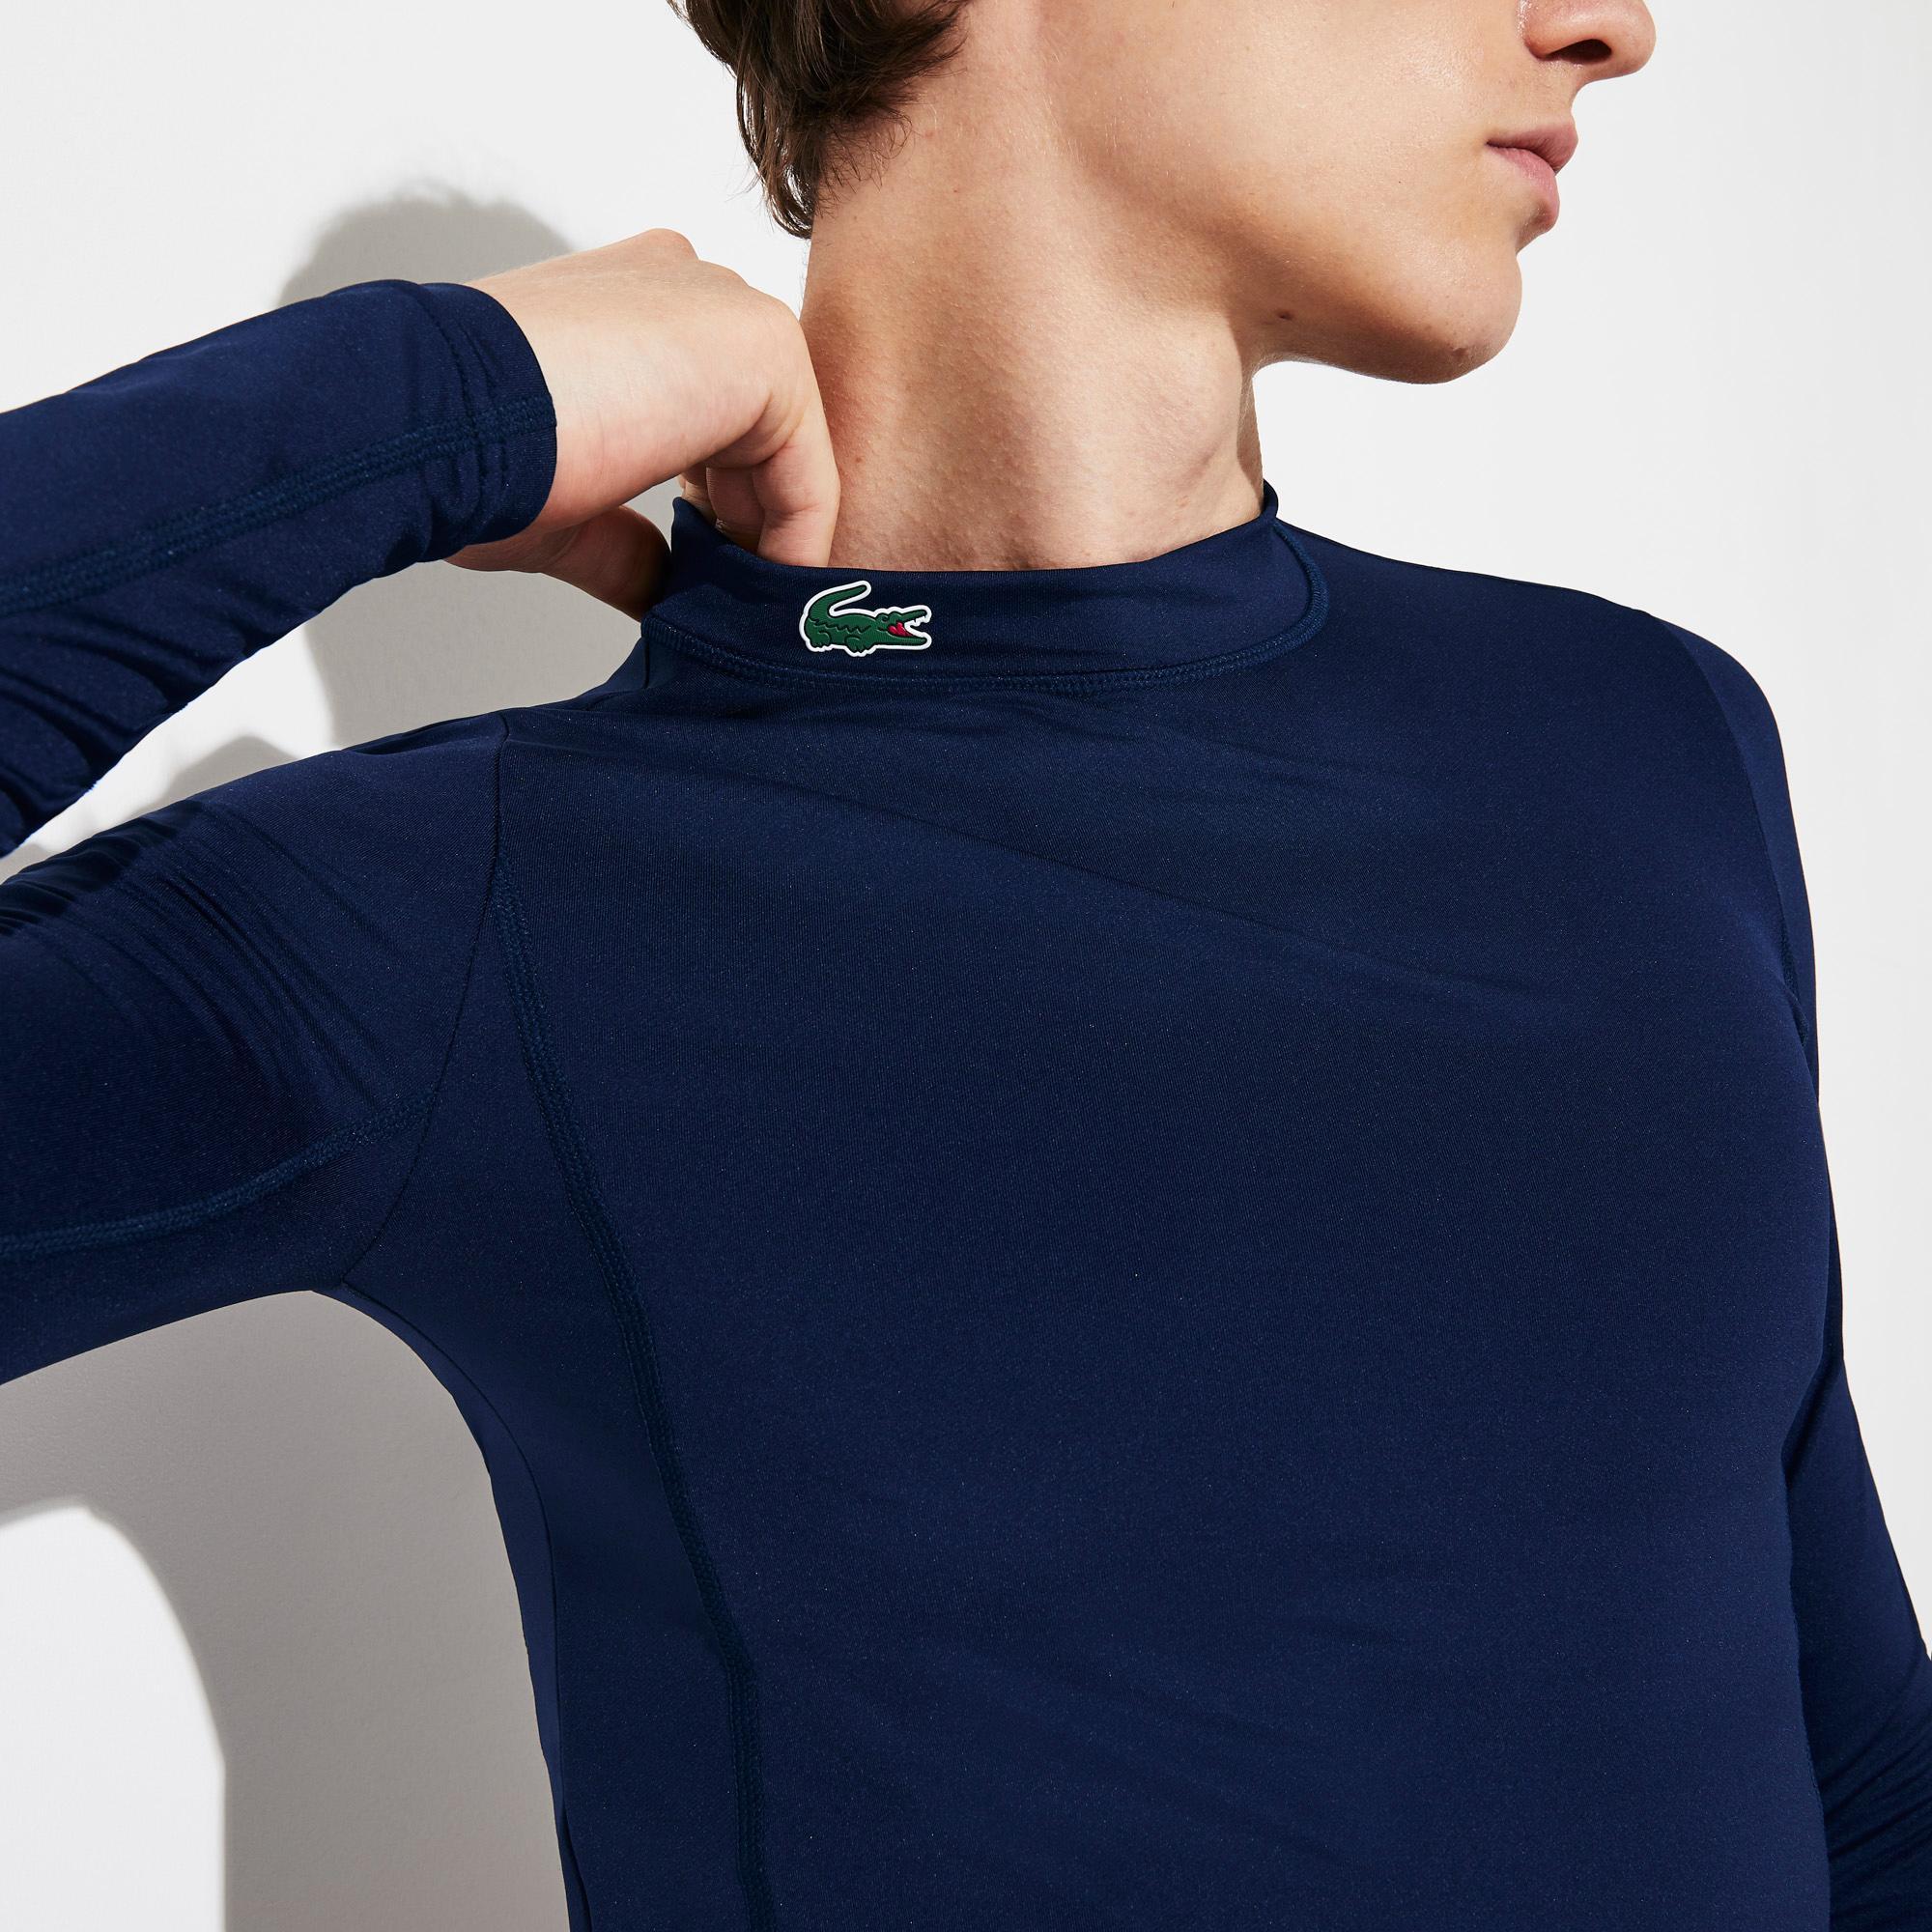 Lacoste Men's SPORT Stand-Up Neck Technical Jersey Golf T-shirt